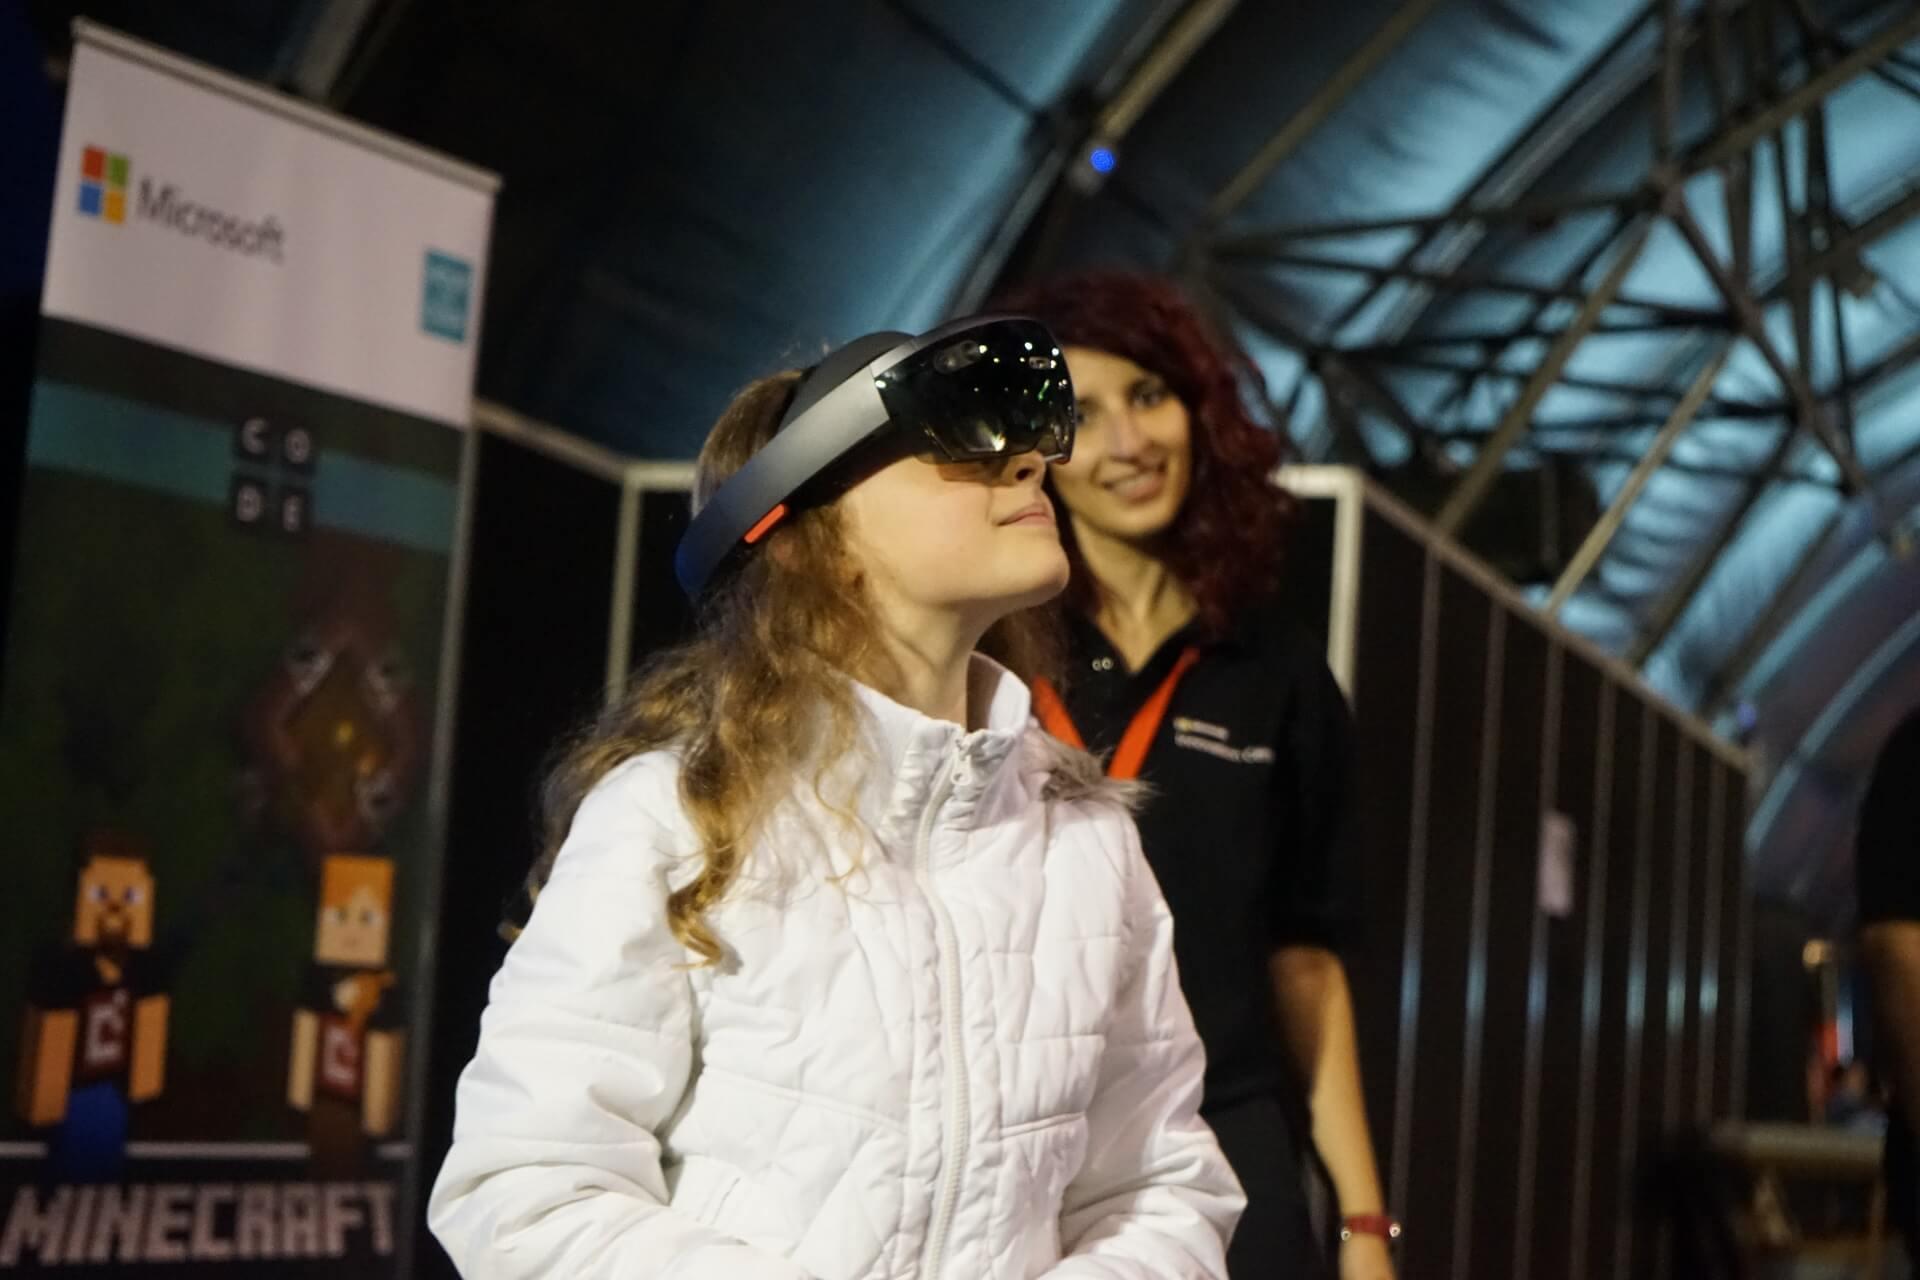 LightBuzz @ Robotics Olympiad HoloLens (1)